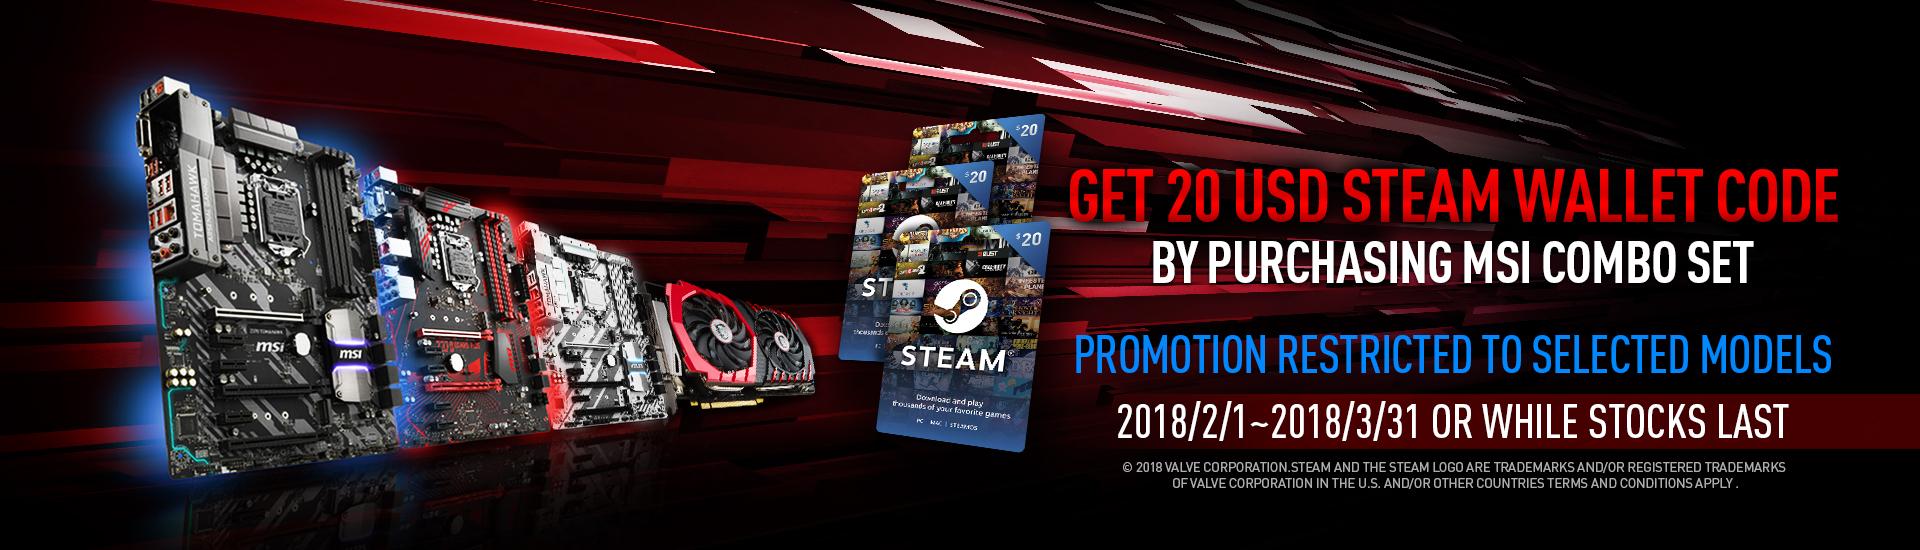 ROW steam wallet code bundle promotion